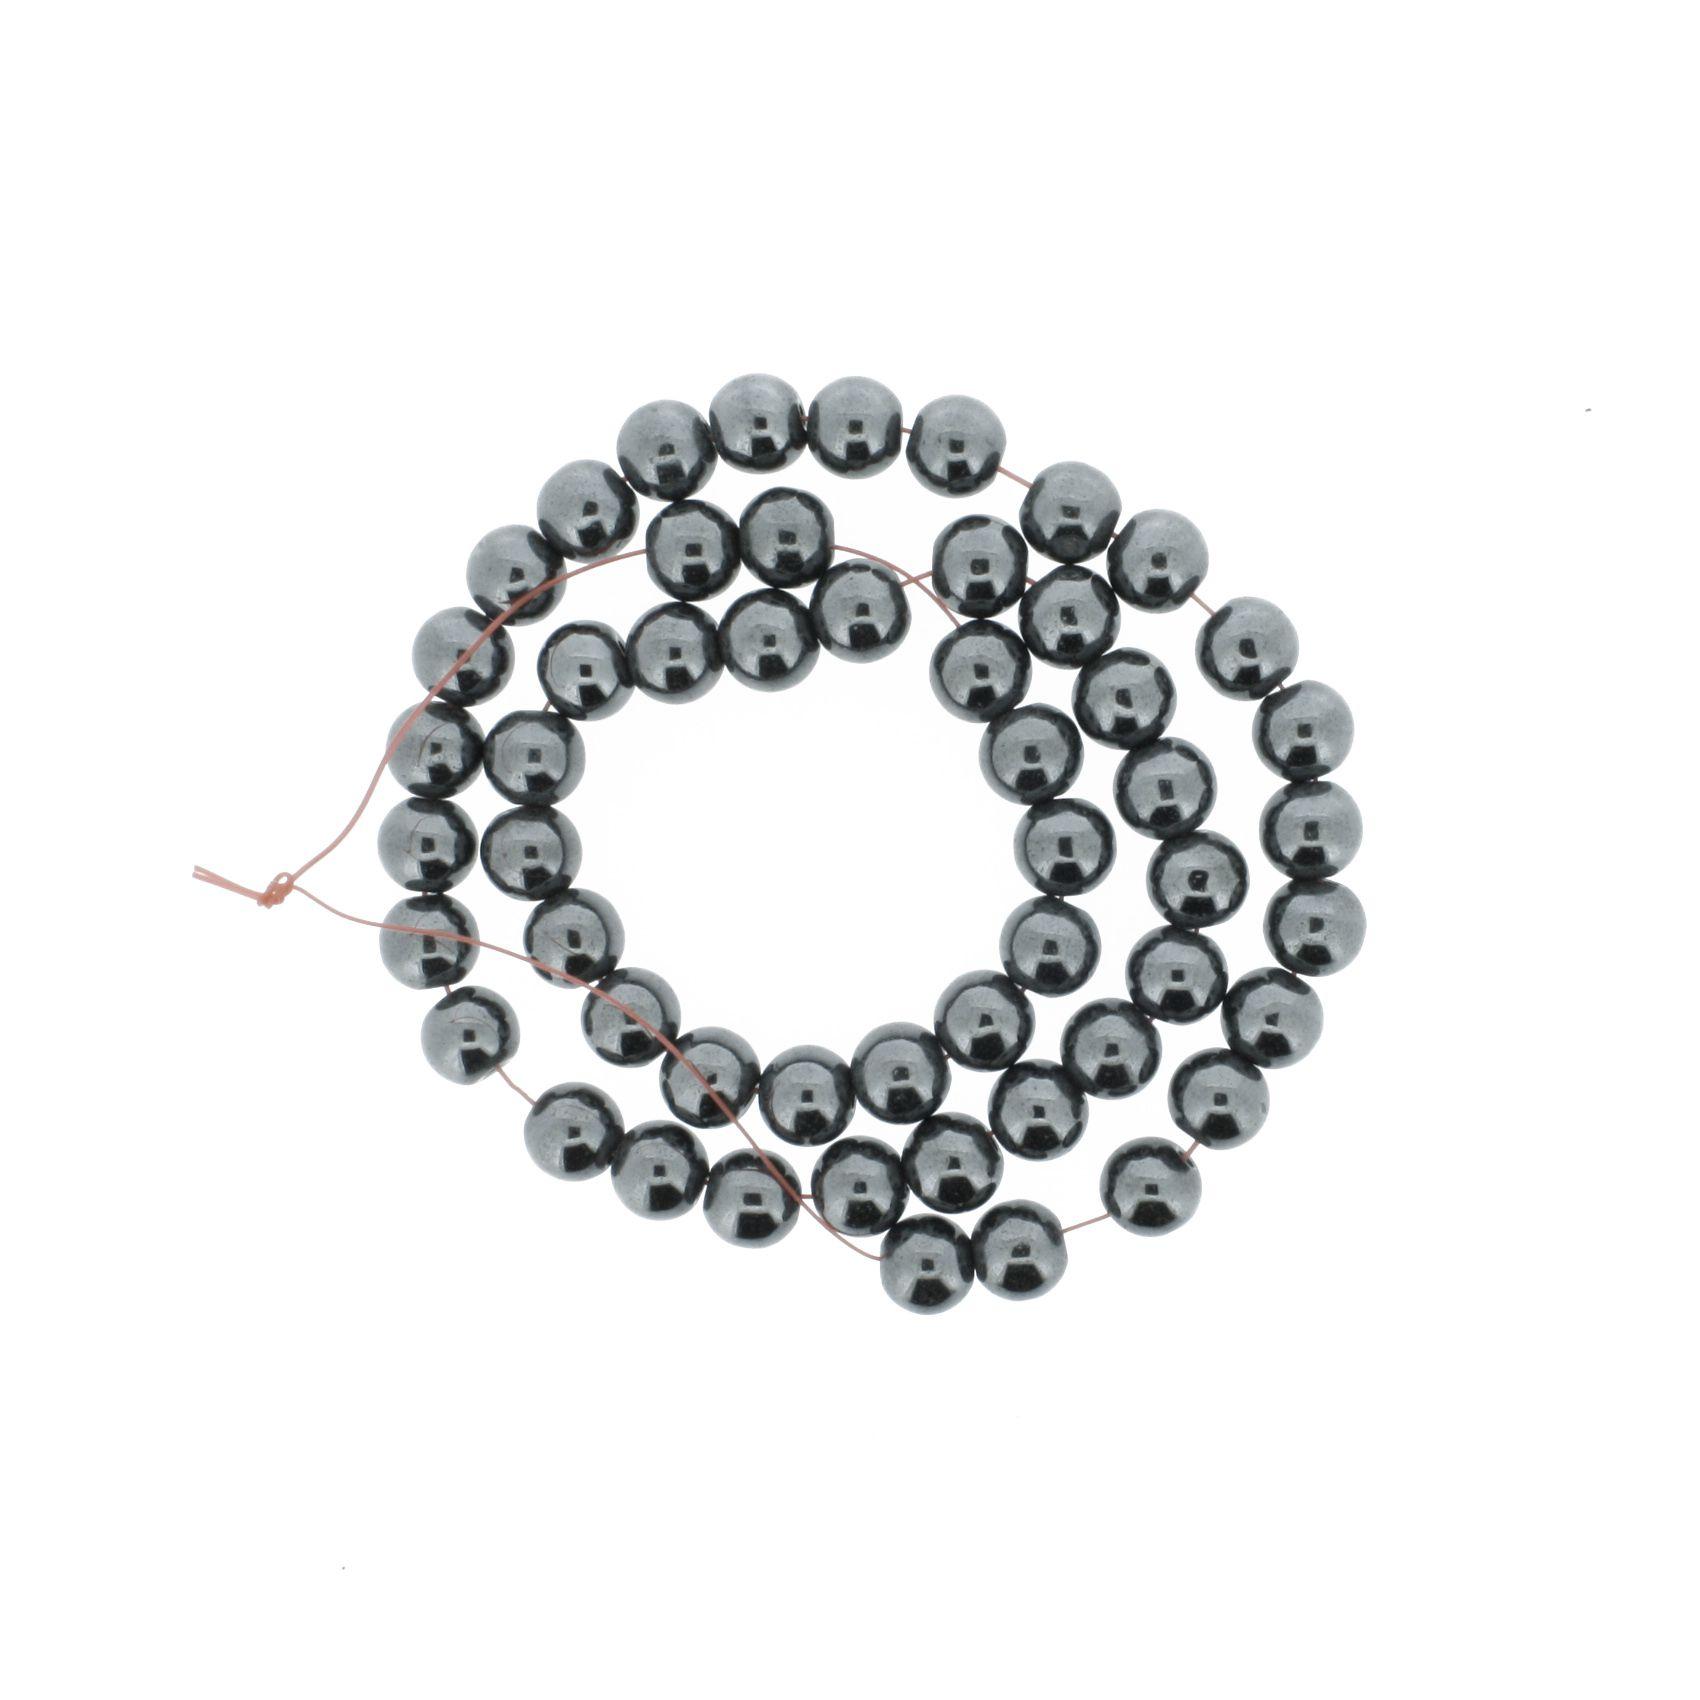 Fio de Pedra - Hematita - 8mm  - Stéphanie Bijoux® - Peças para Bijuterias e Artesanato